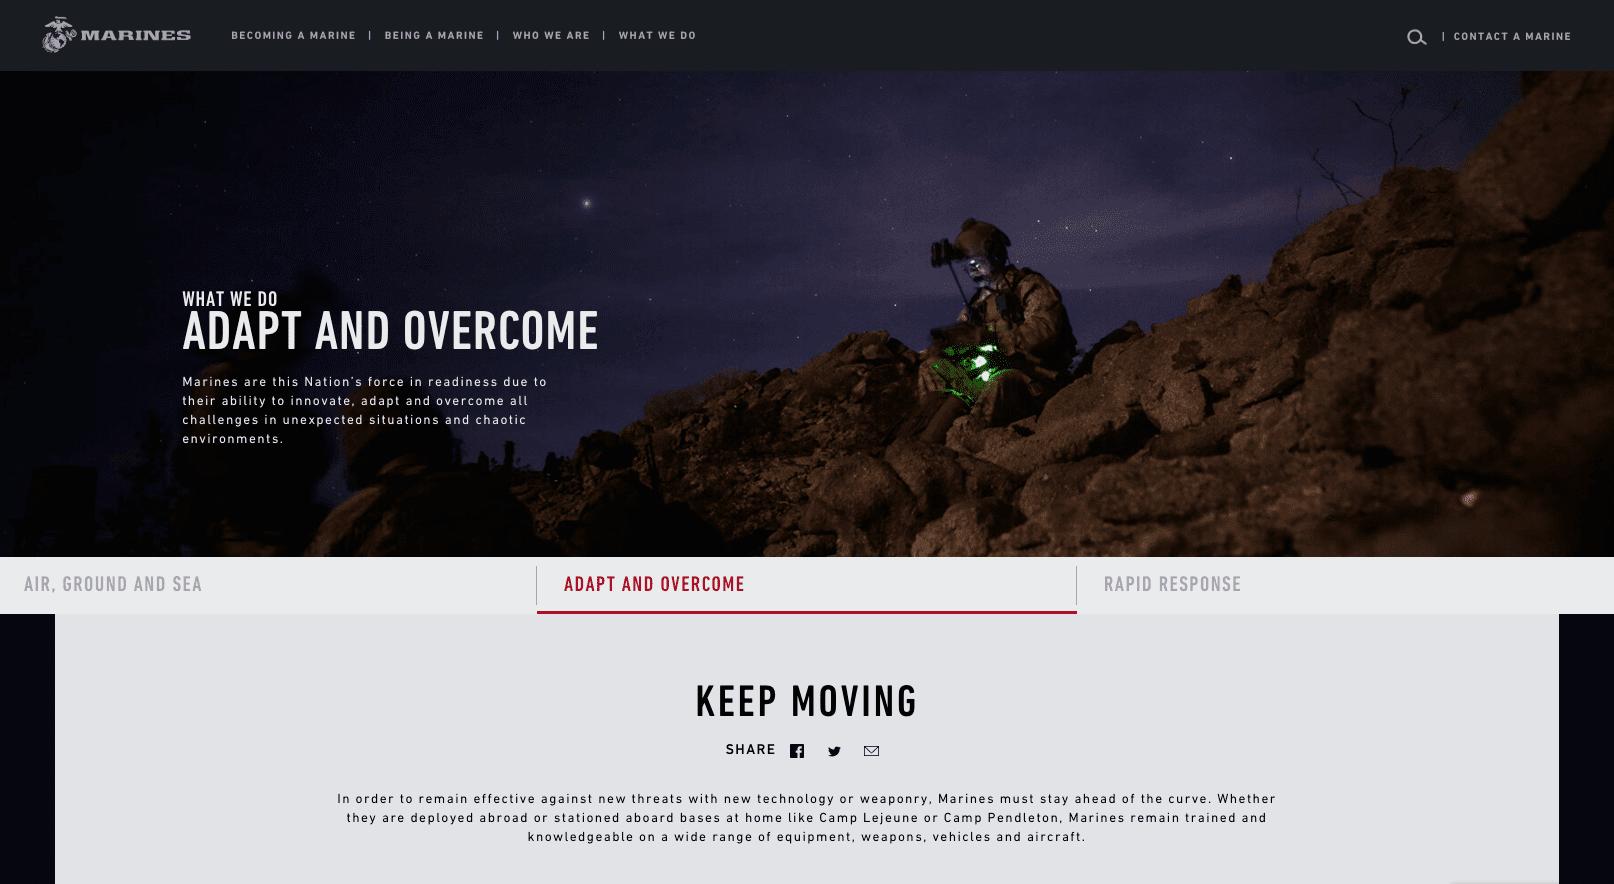 Screengrab of the Marines' recruitment website features a dark mode design